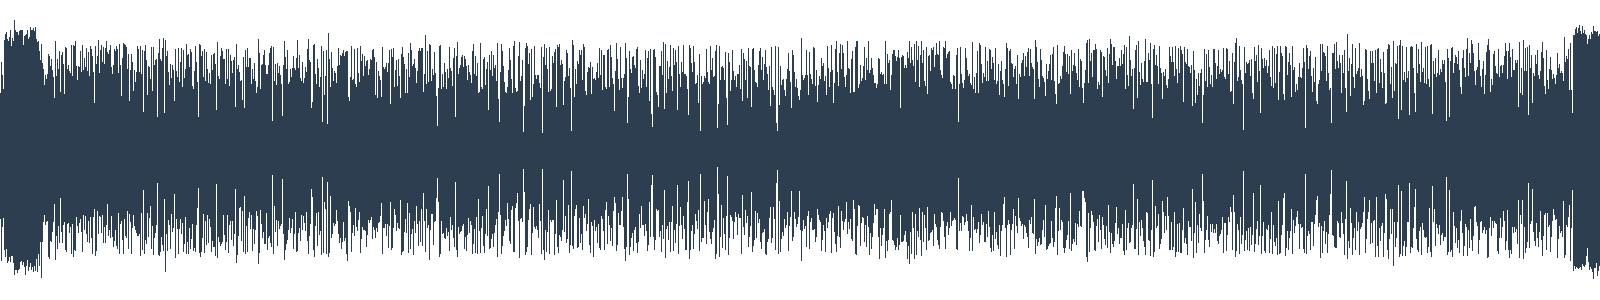 Eko darčeky waveform